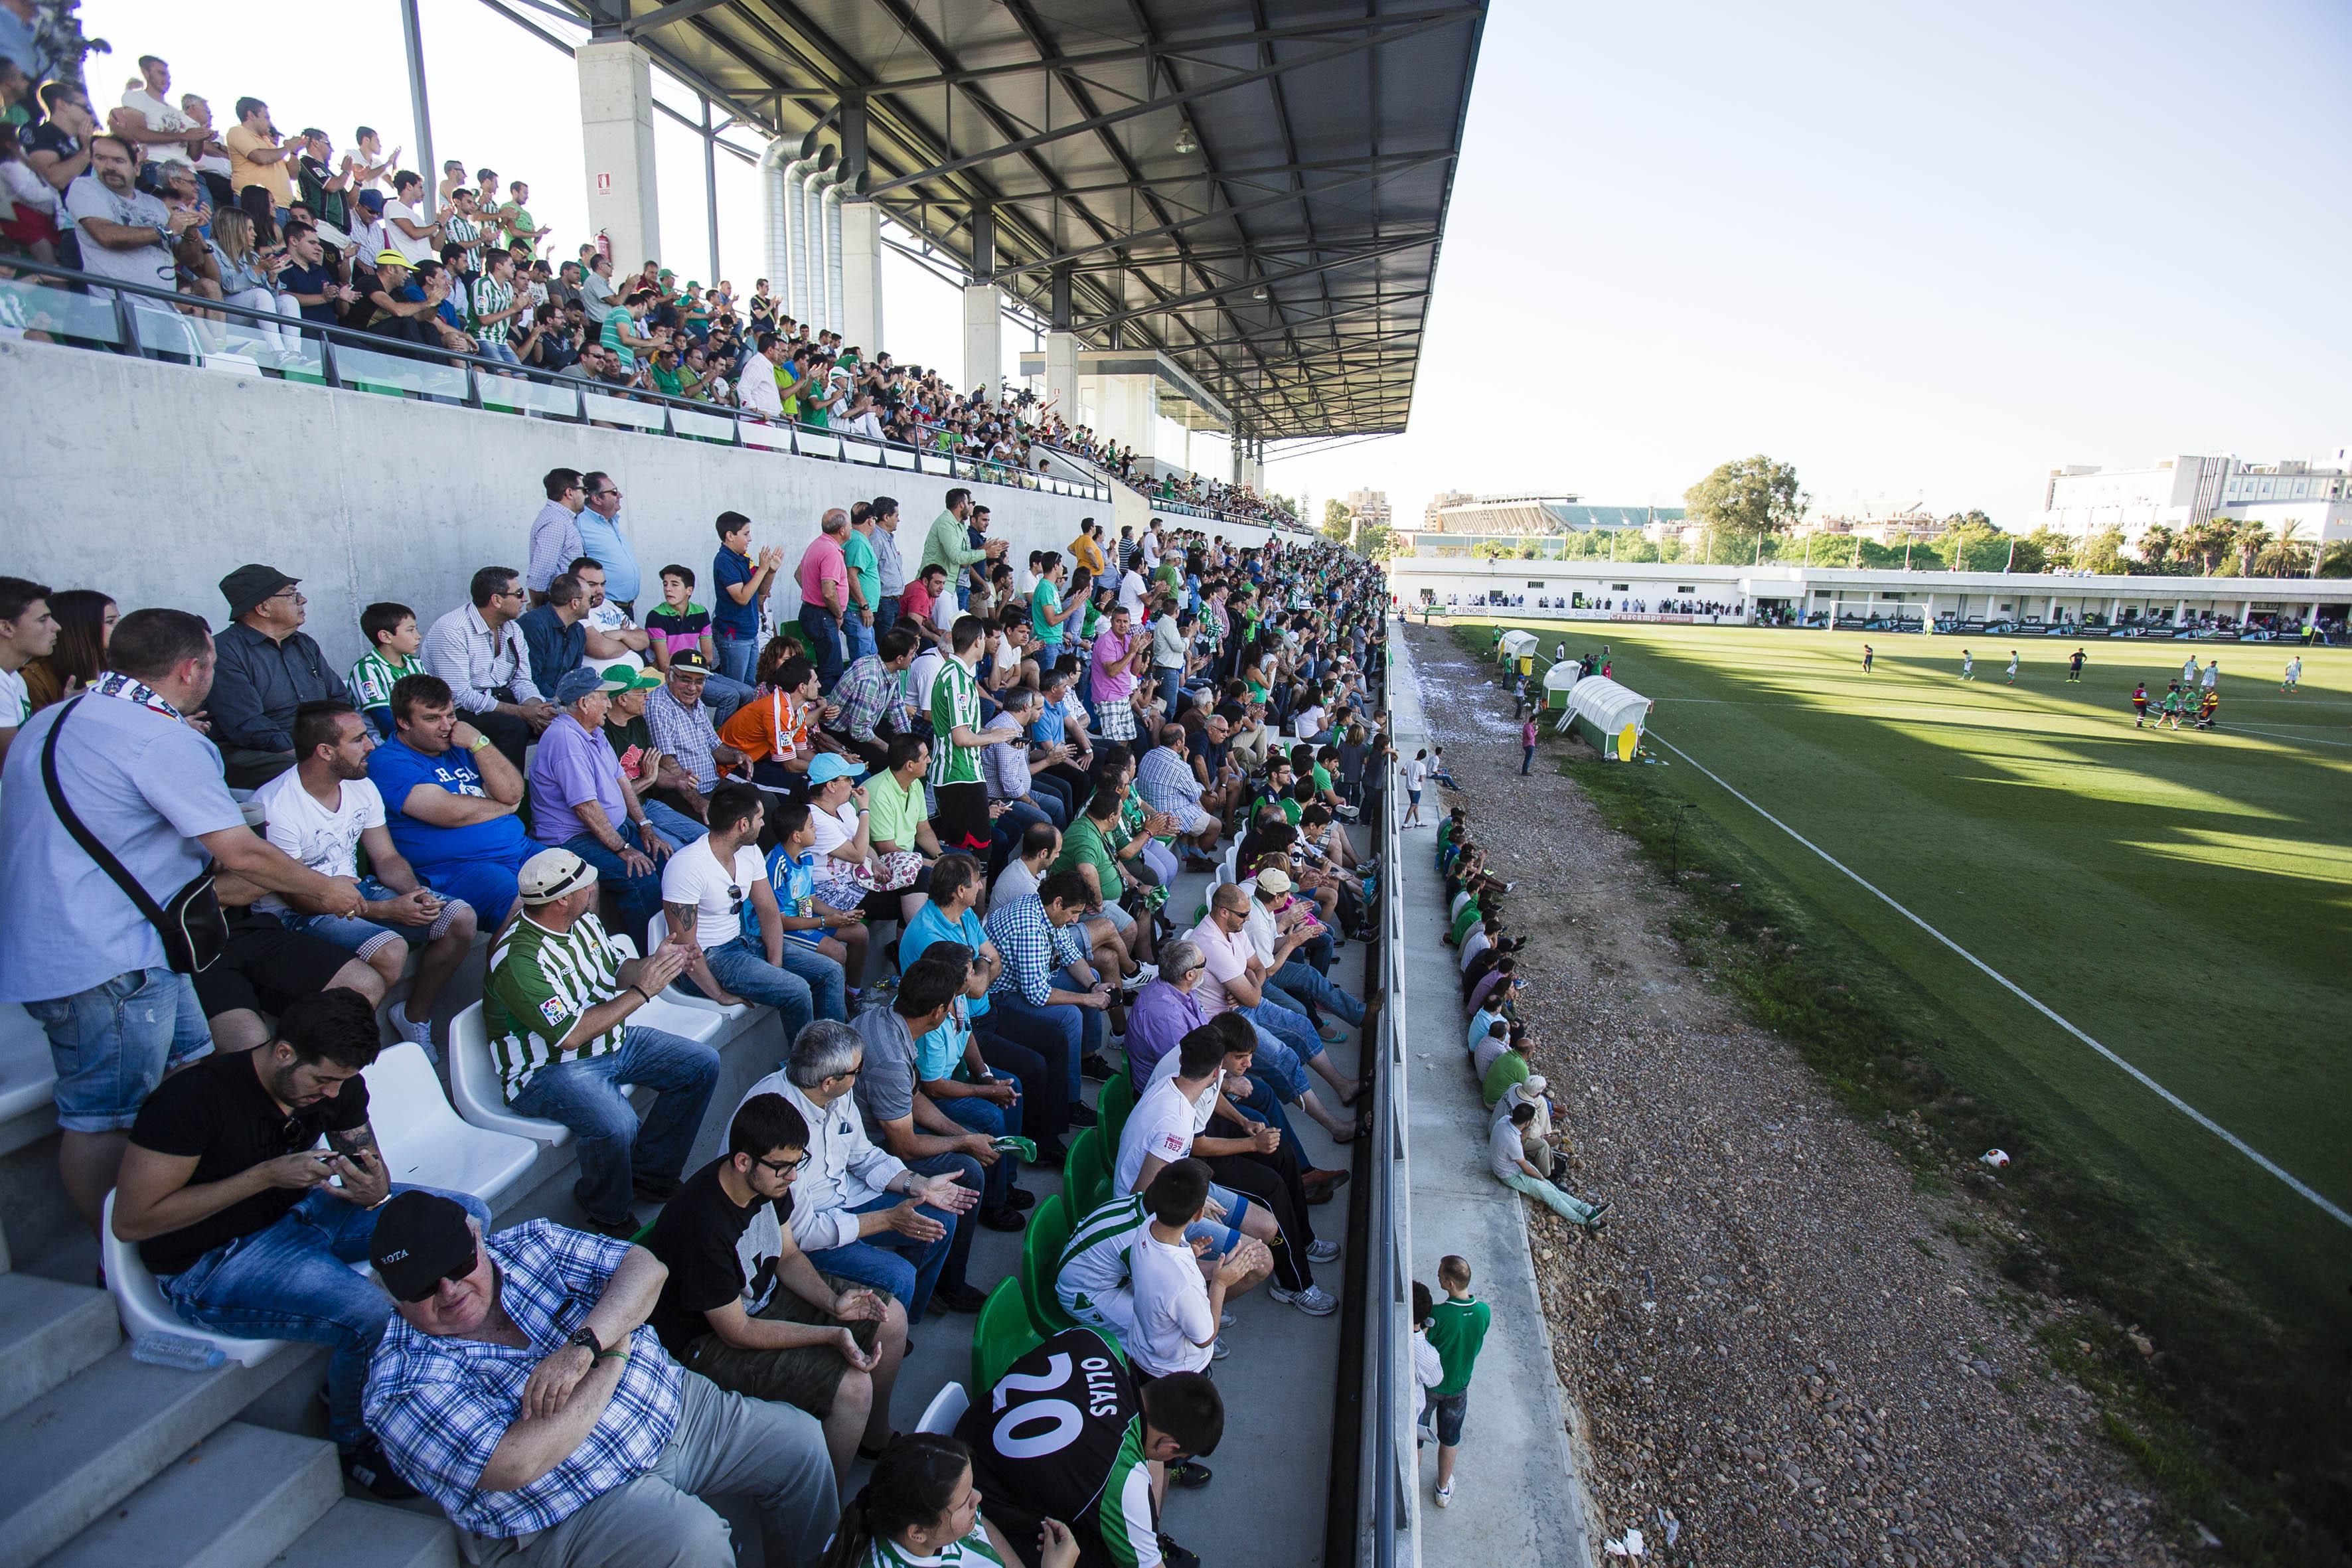 Sevilla, 25/05/2014 Partido Betis B - Murcia, de la fase de ascenso a